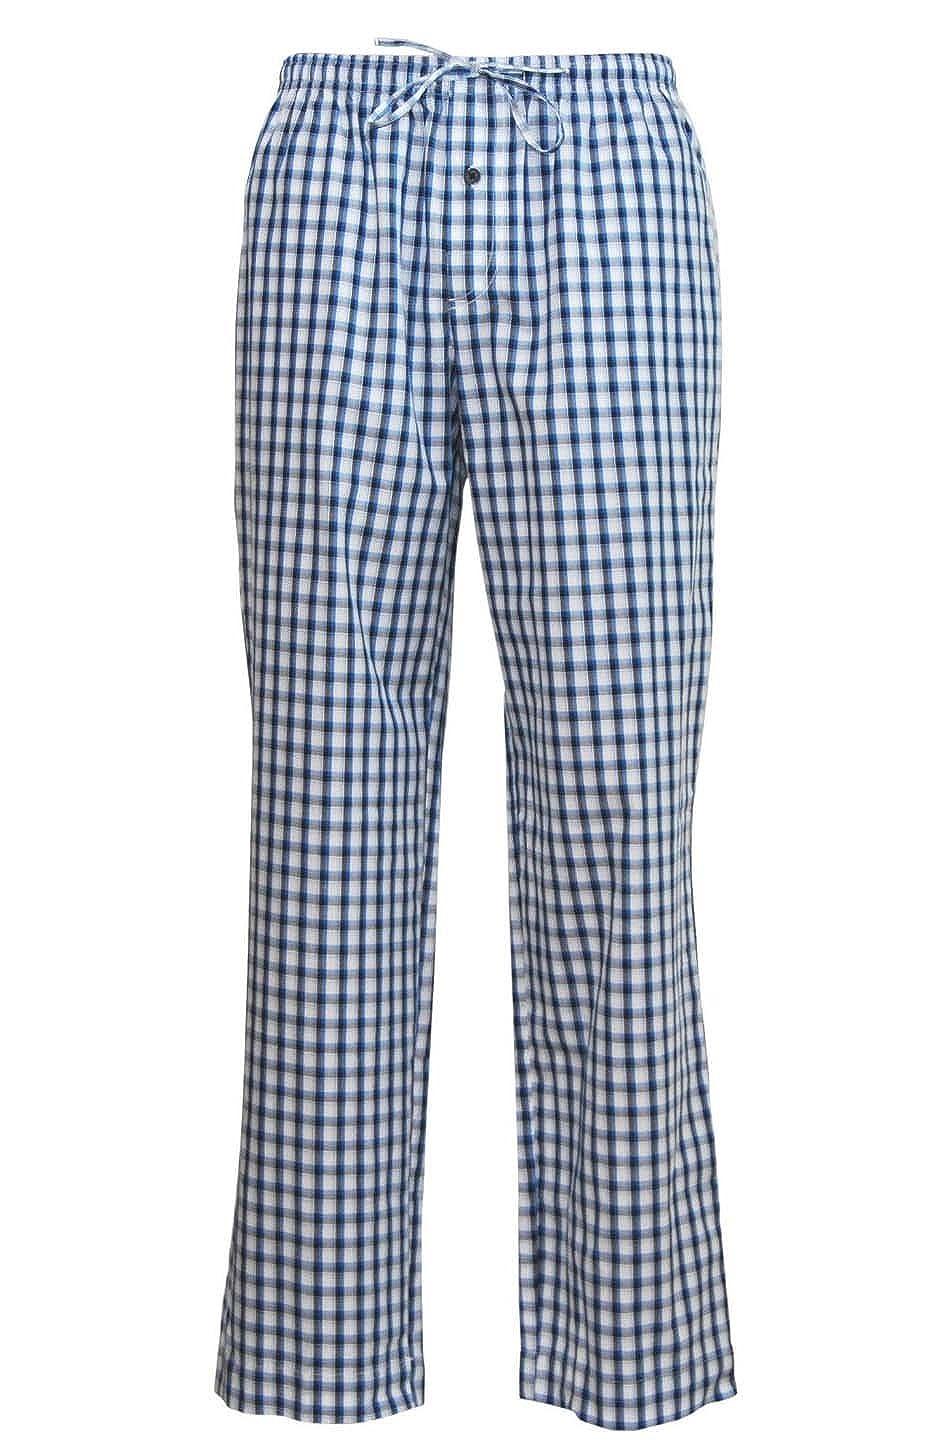 Jockey Checked Lounge Pant With Pockets In Denim 3XL 4XL 5XL 6XL